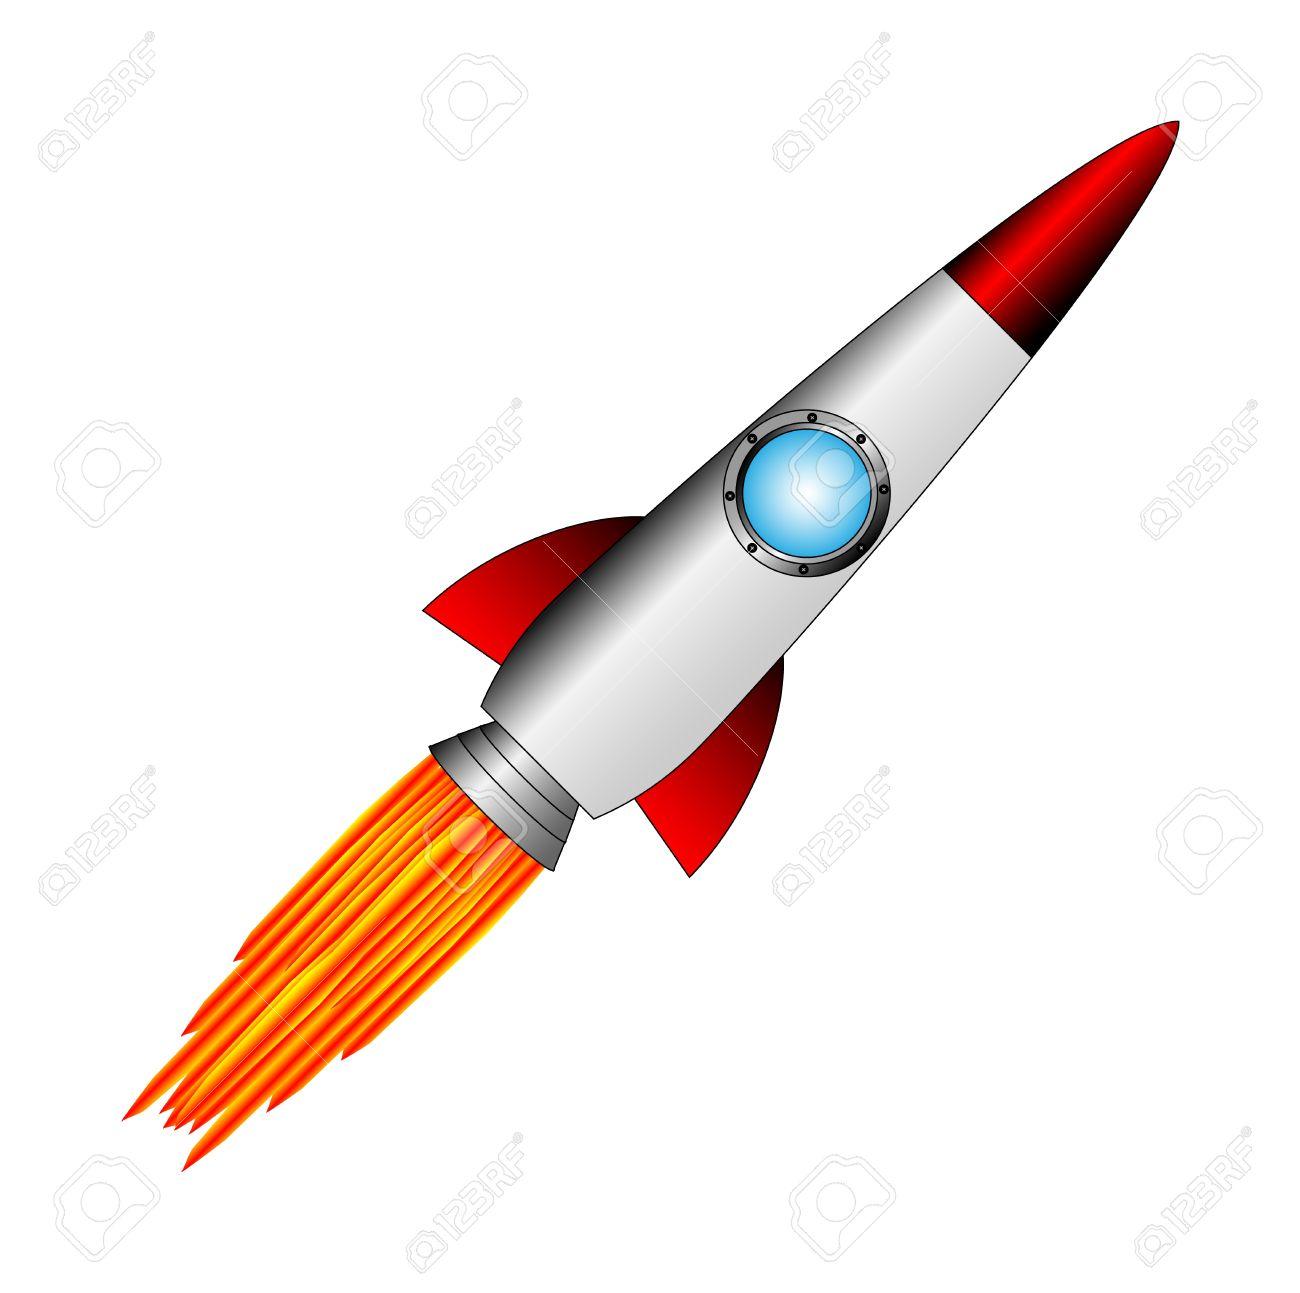 1300x1293 Missile Clipart Rocket